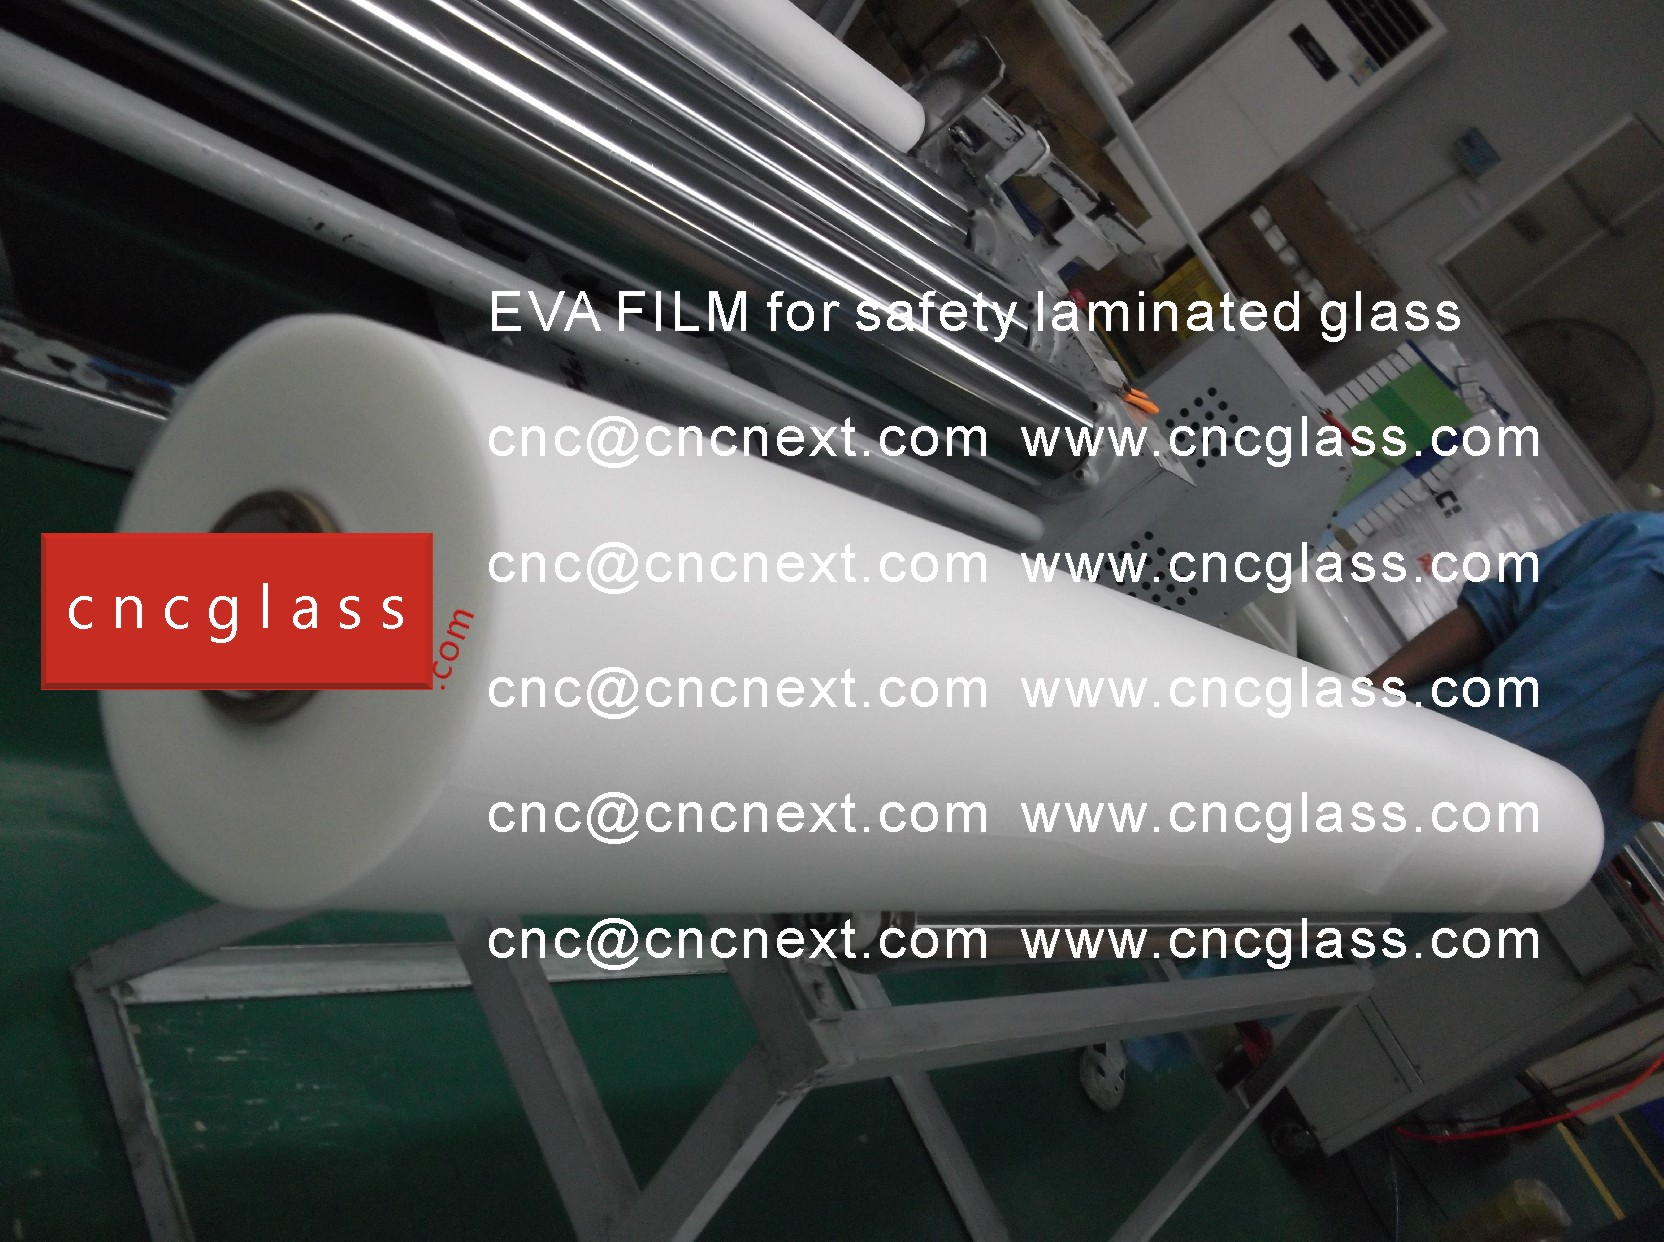 004 EVAFORCE EVA FILM FOR SAFETY LAMINATED GLASS